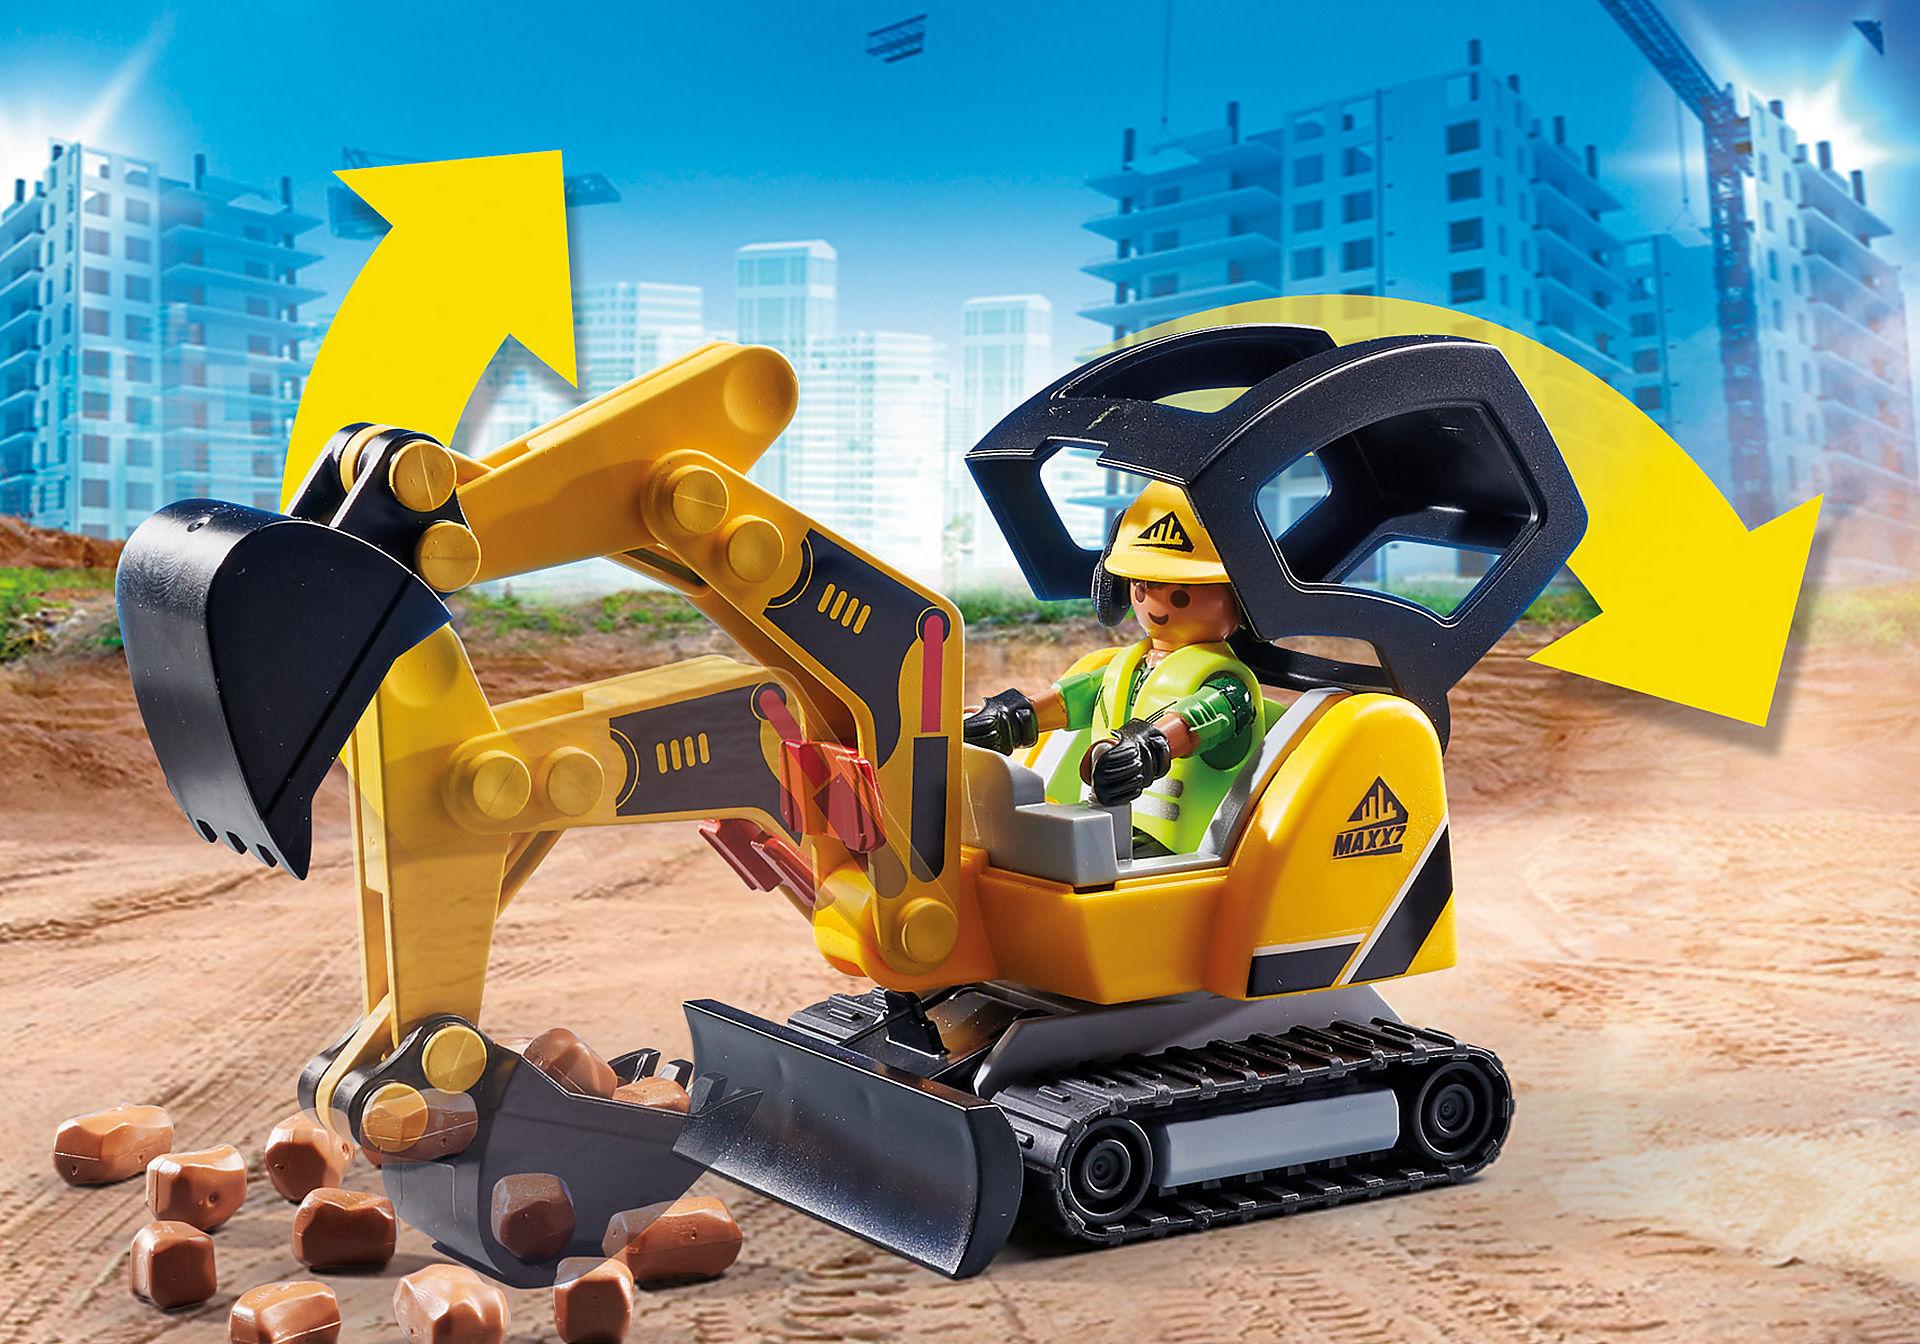 70443 Mini Excavadora zoom image5